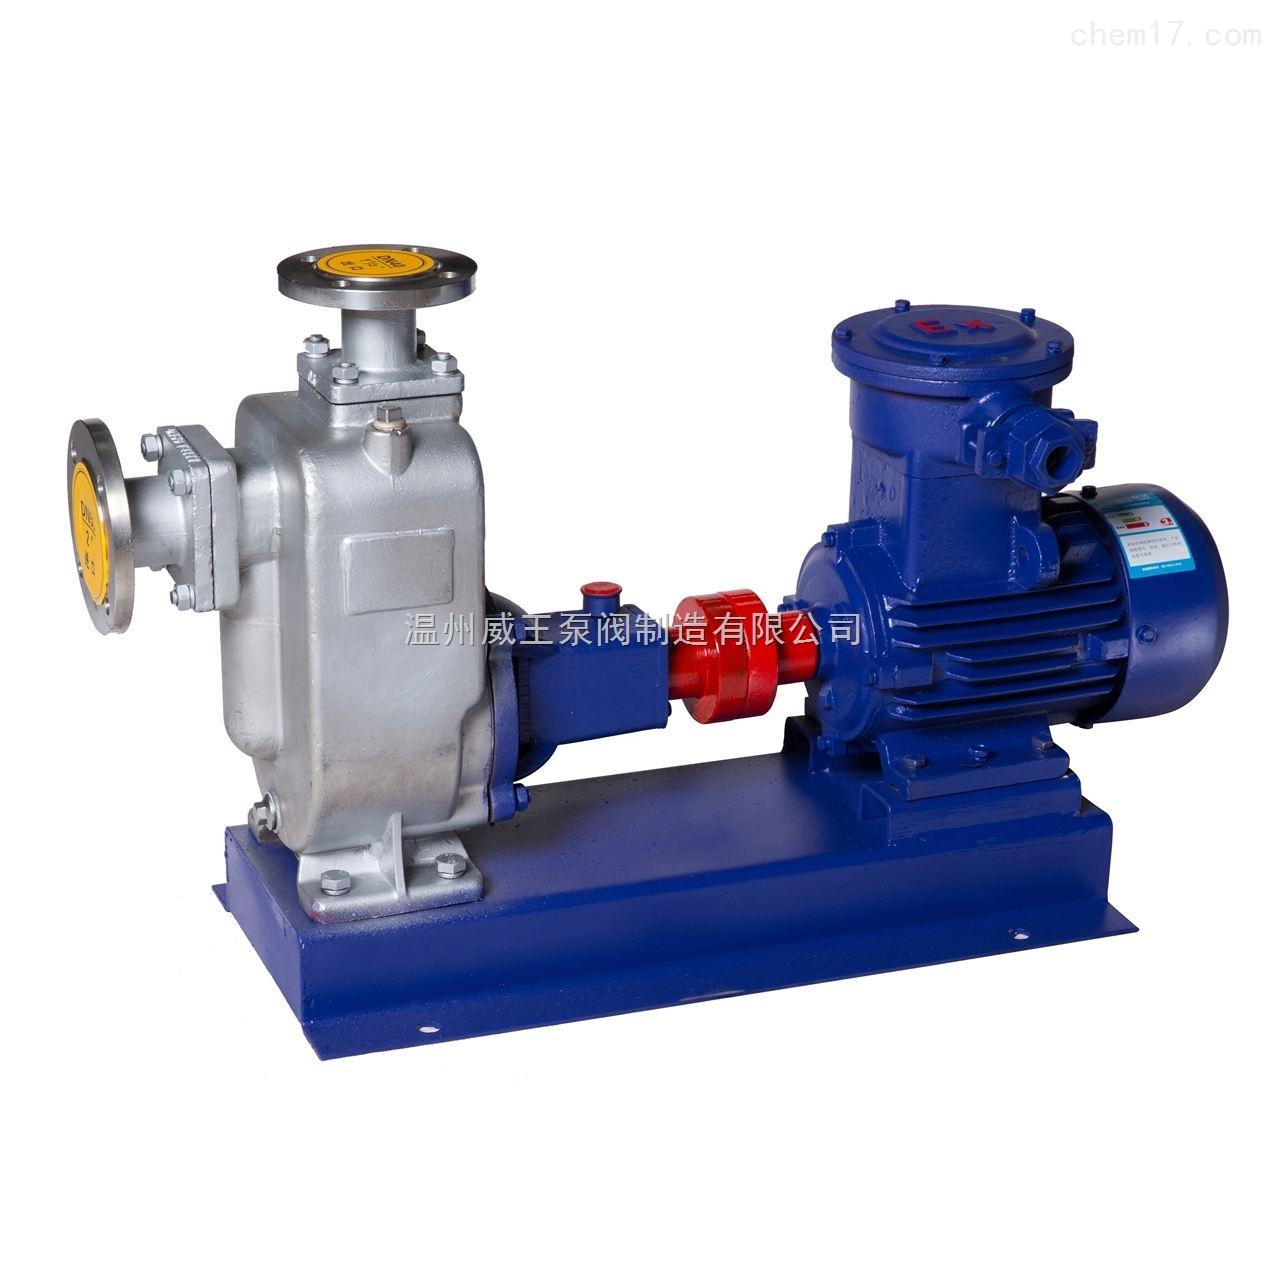 ZW型系列无堵塞不锈钢自吸式排污泵